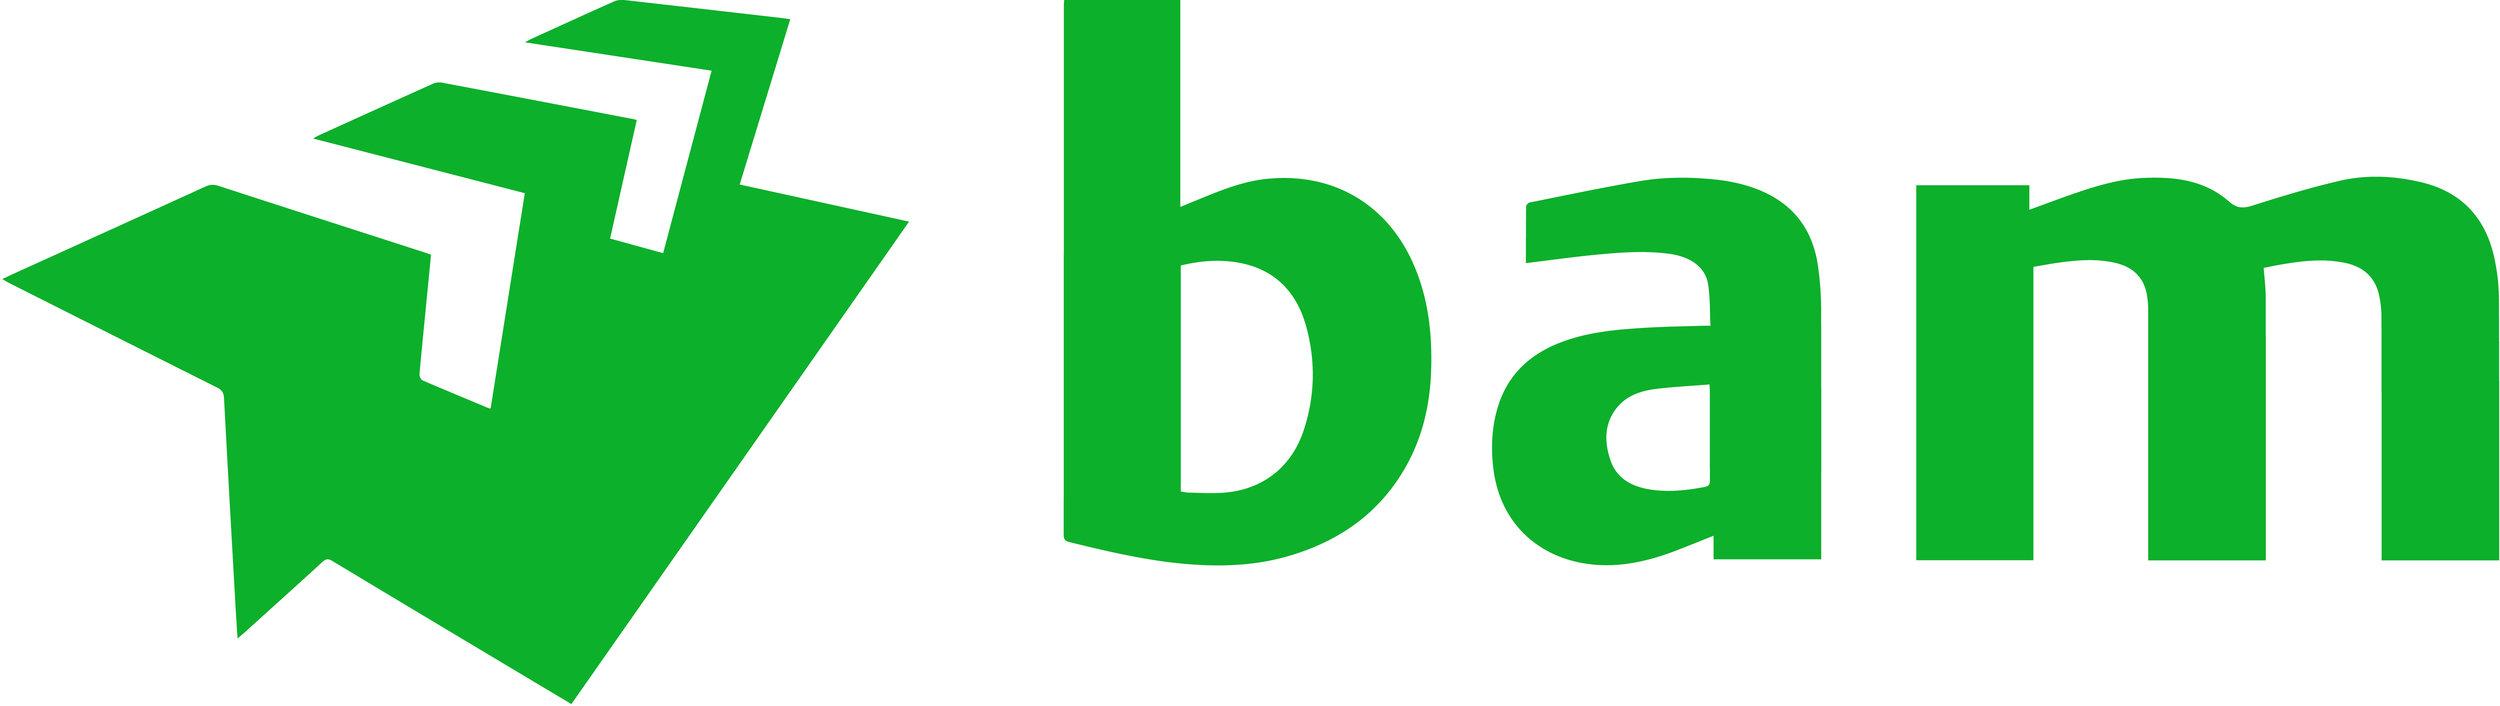 BAM Master-Logo_Green RGB-01.jpg